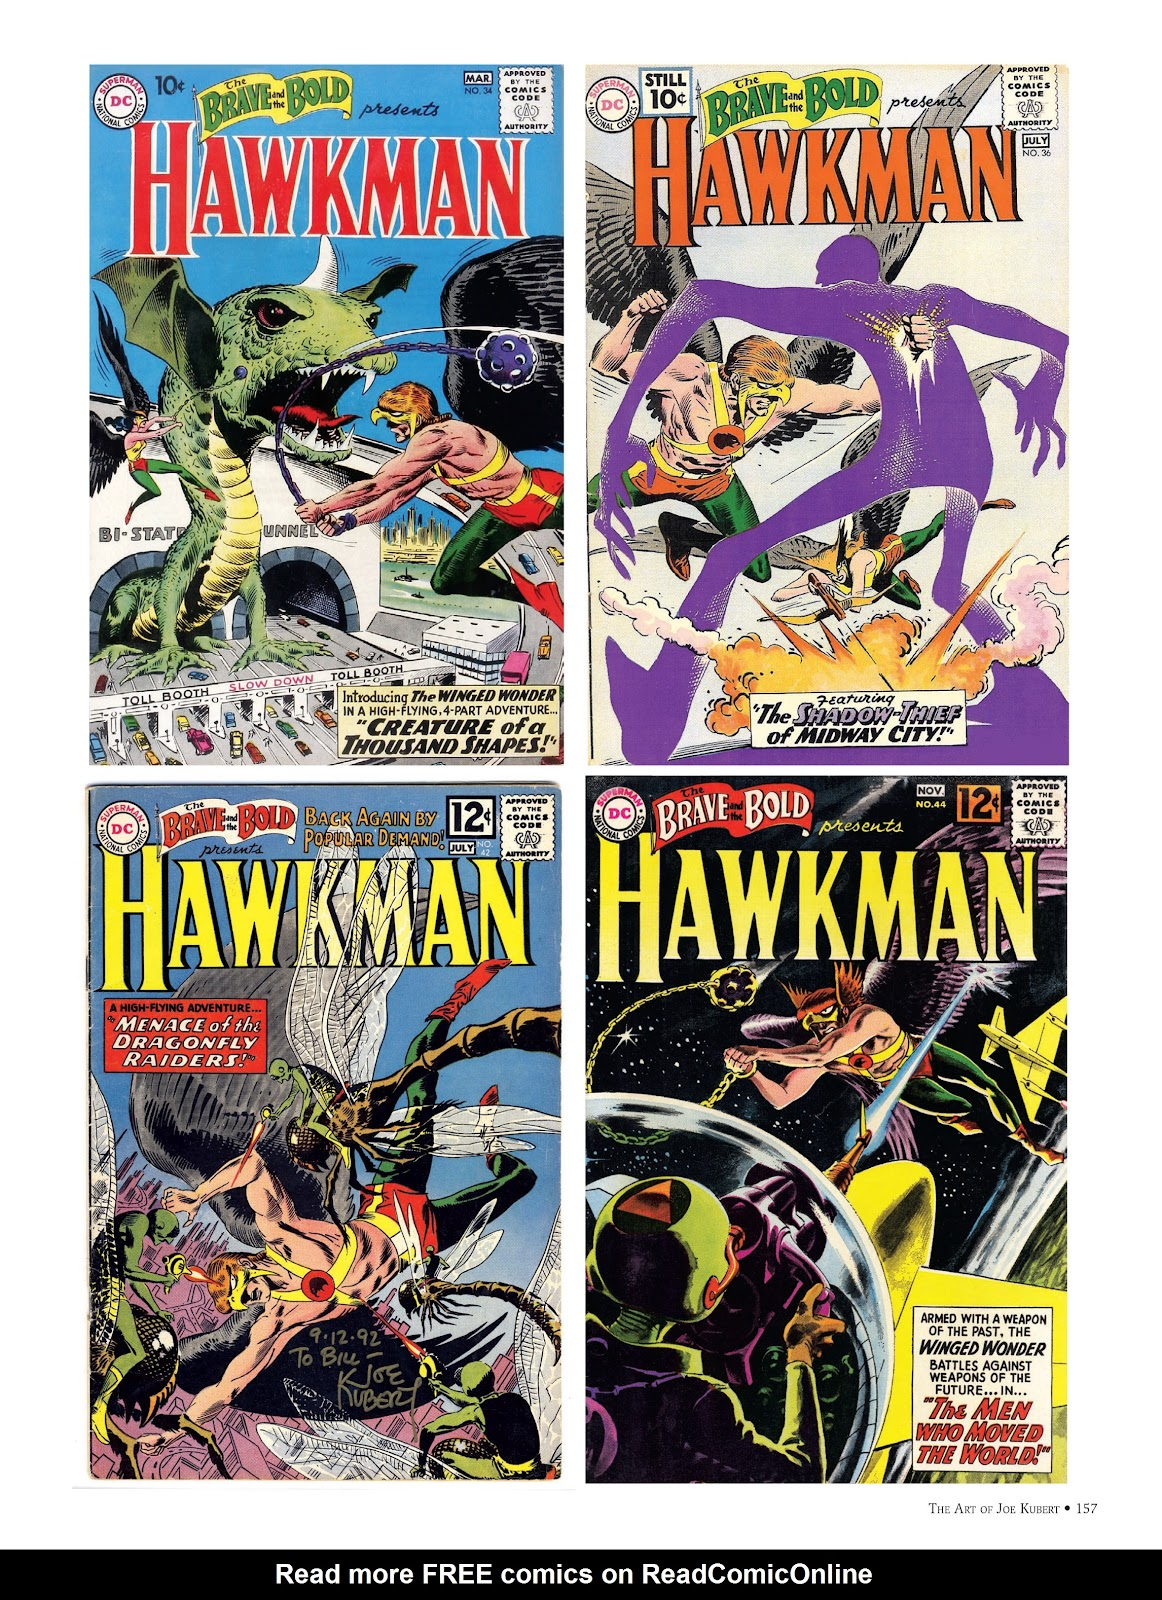 Read online The Art of Joe Kubert comic -  Issue # TPB (Part 2) - 57